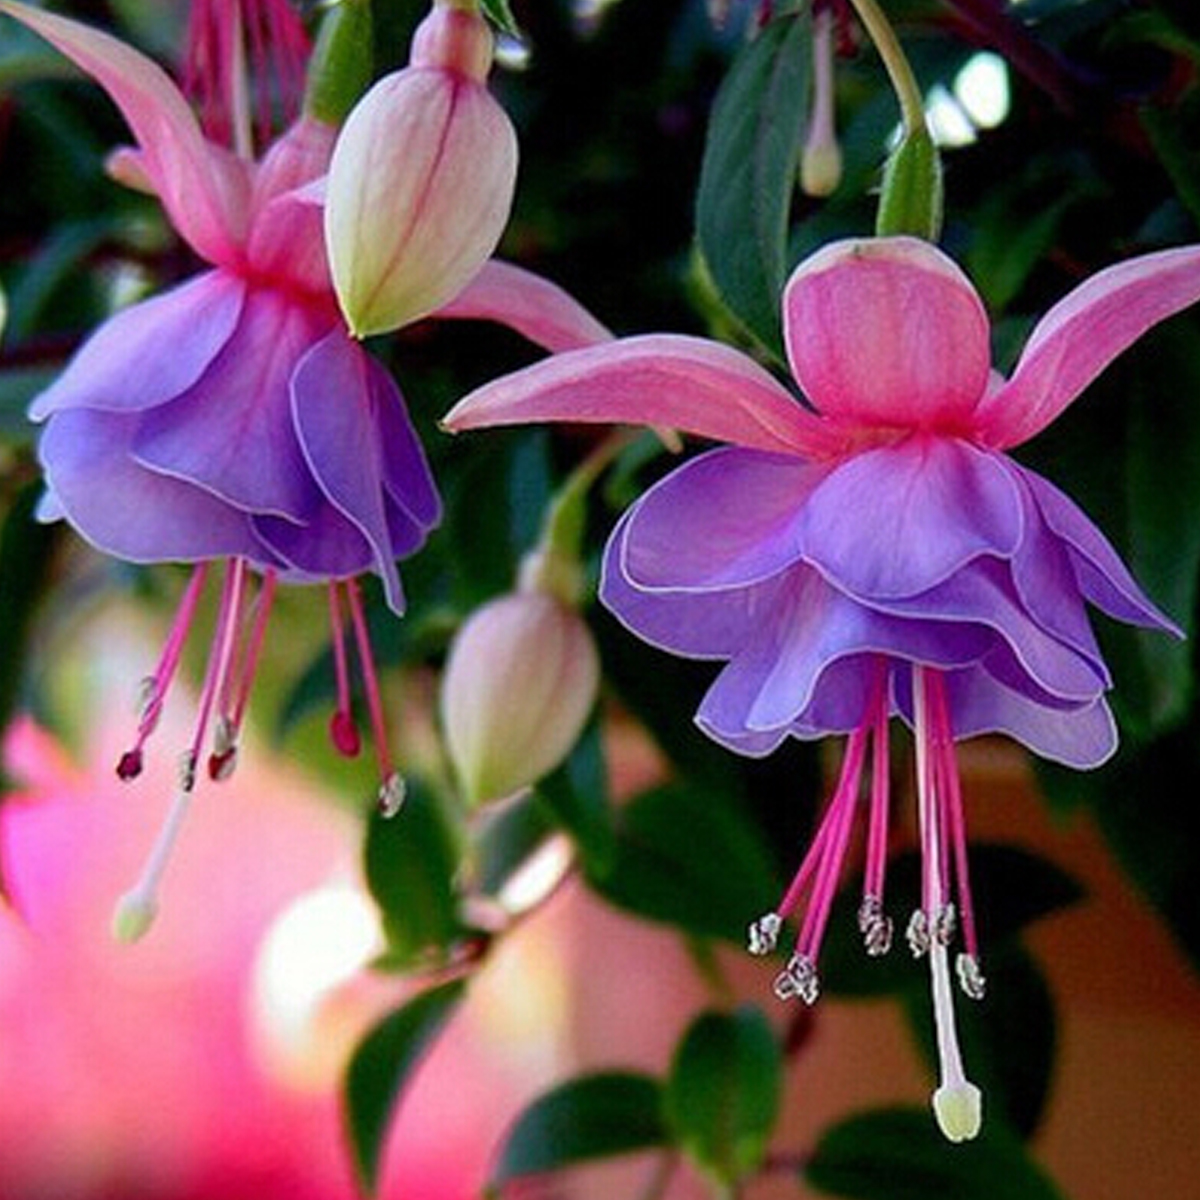 Hardy bush fuchsia flower seeds golden bell forsythia home garden detail image mightylinksfo